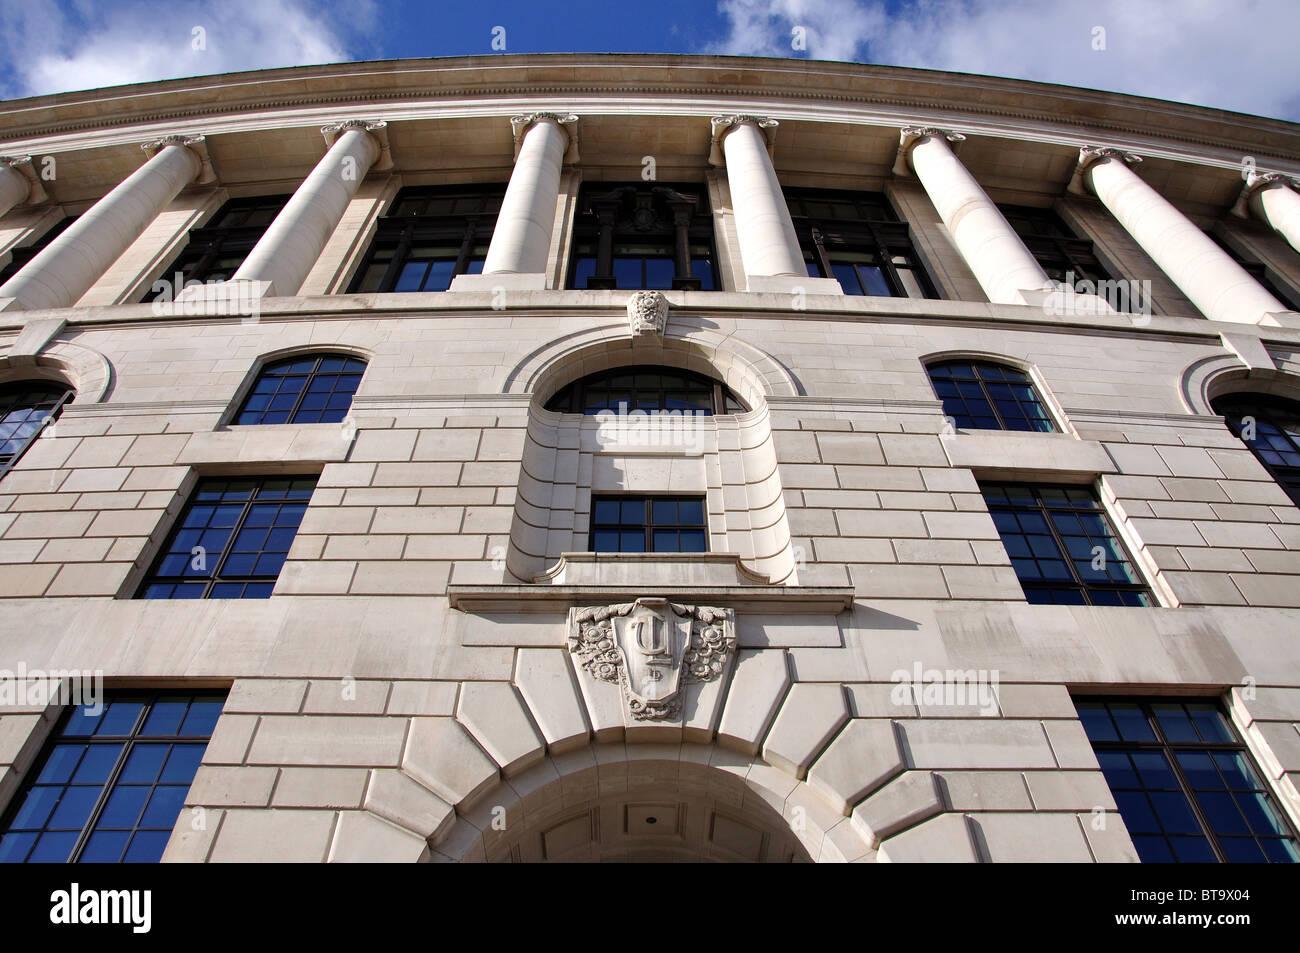 Art deco facade of Unilever House, Victoria Embankment, Blackfriars, City of London, Greater London, England, United - Stock Image